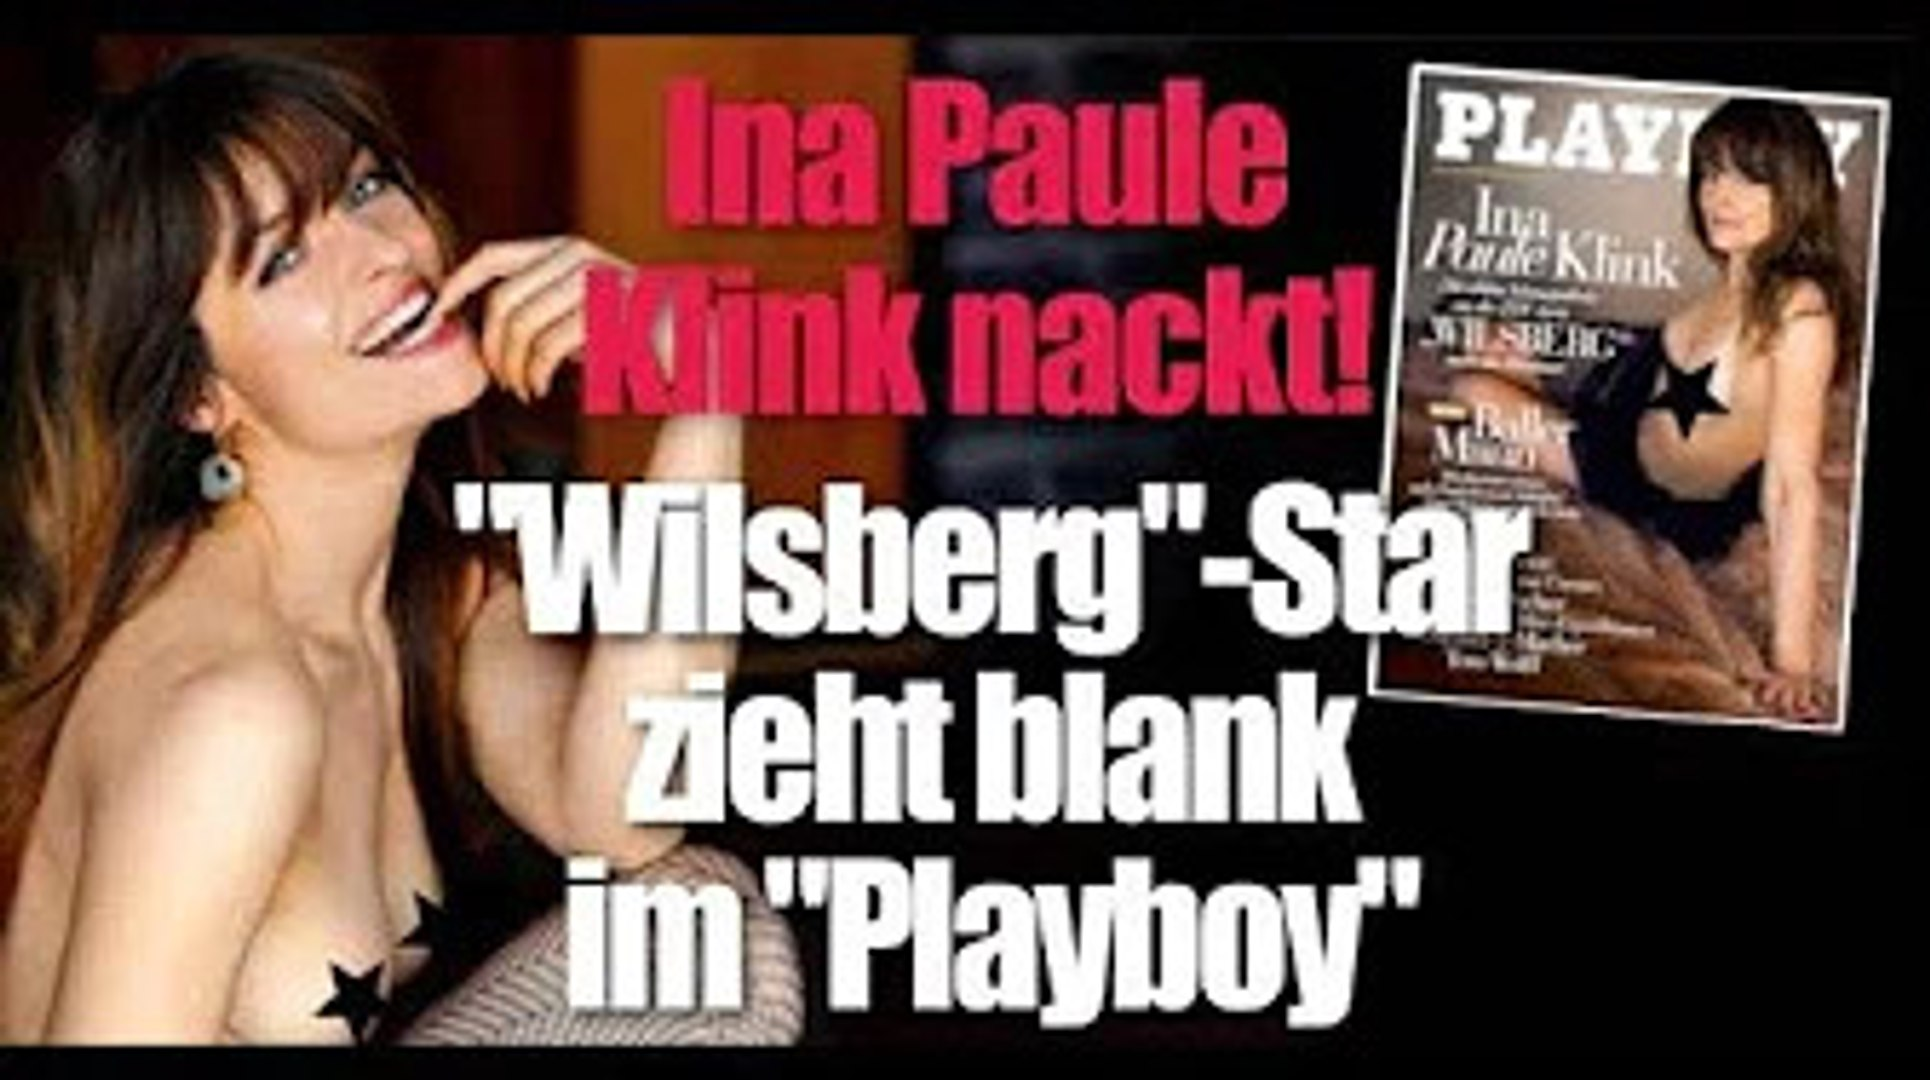 Nackt paule sex klink Ina Paule